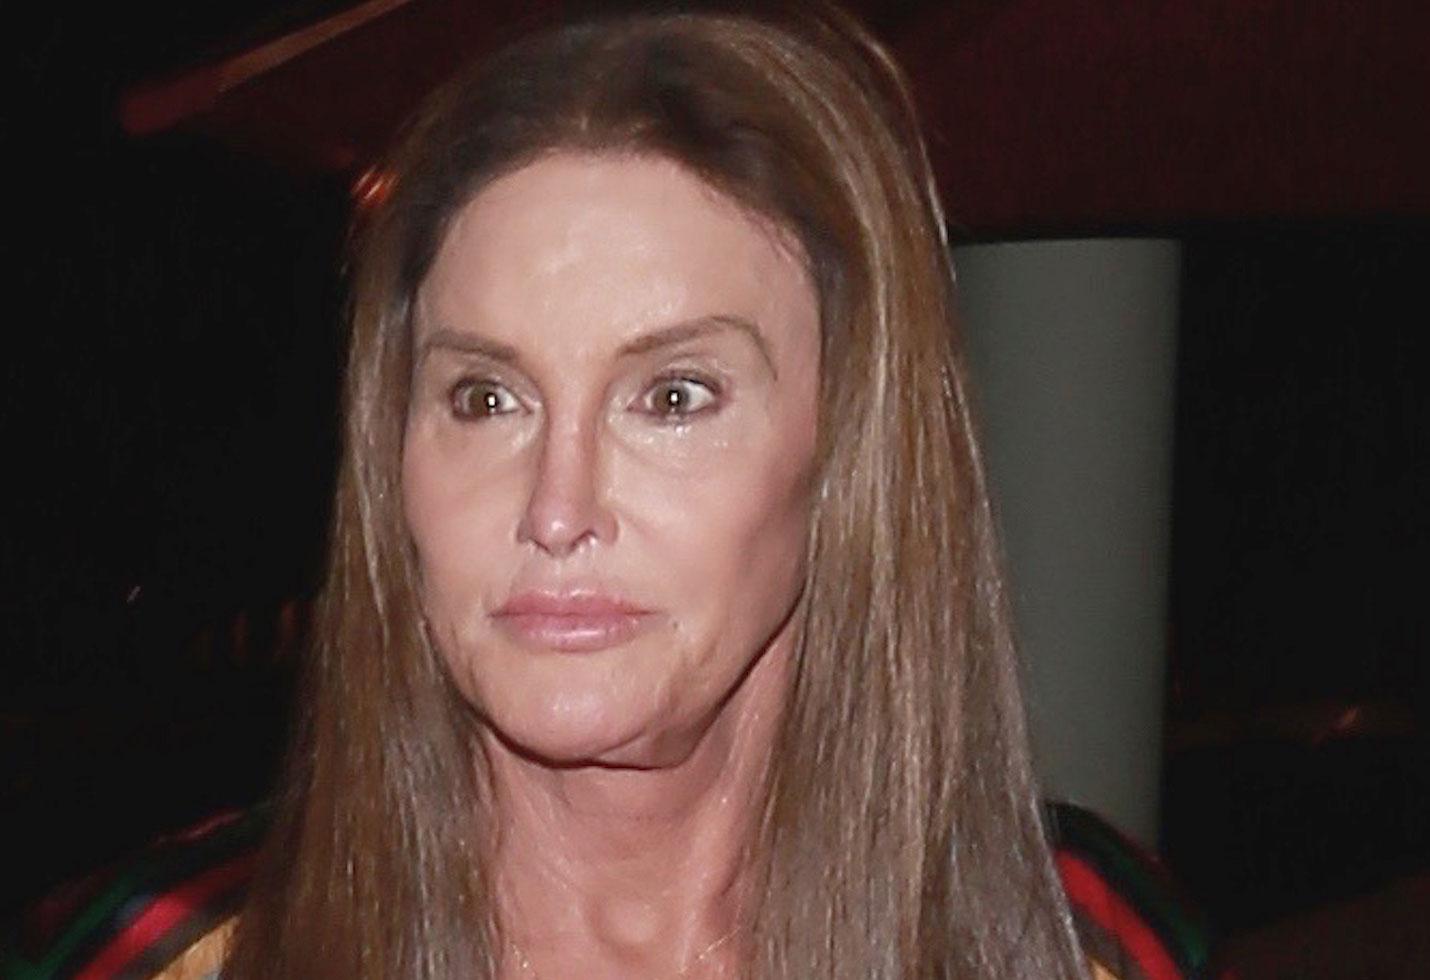 Caitlyn jenner plastic surgery disaster photos